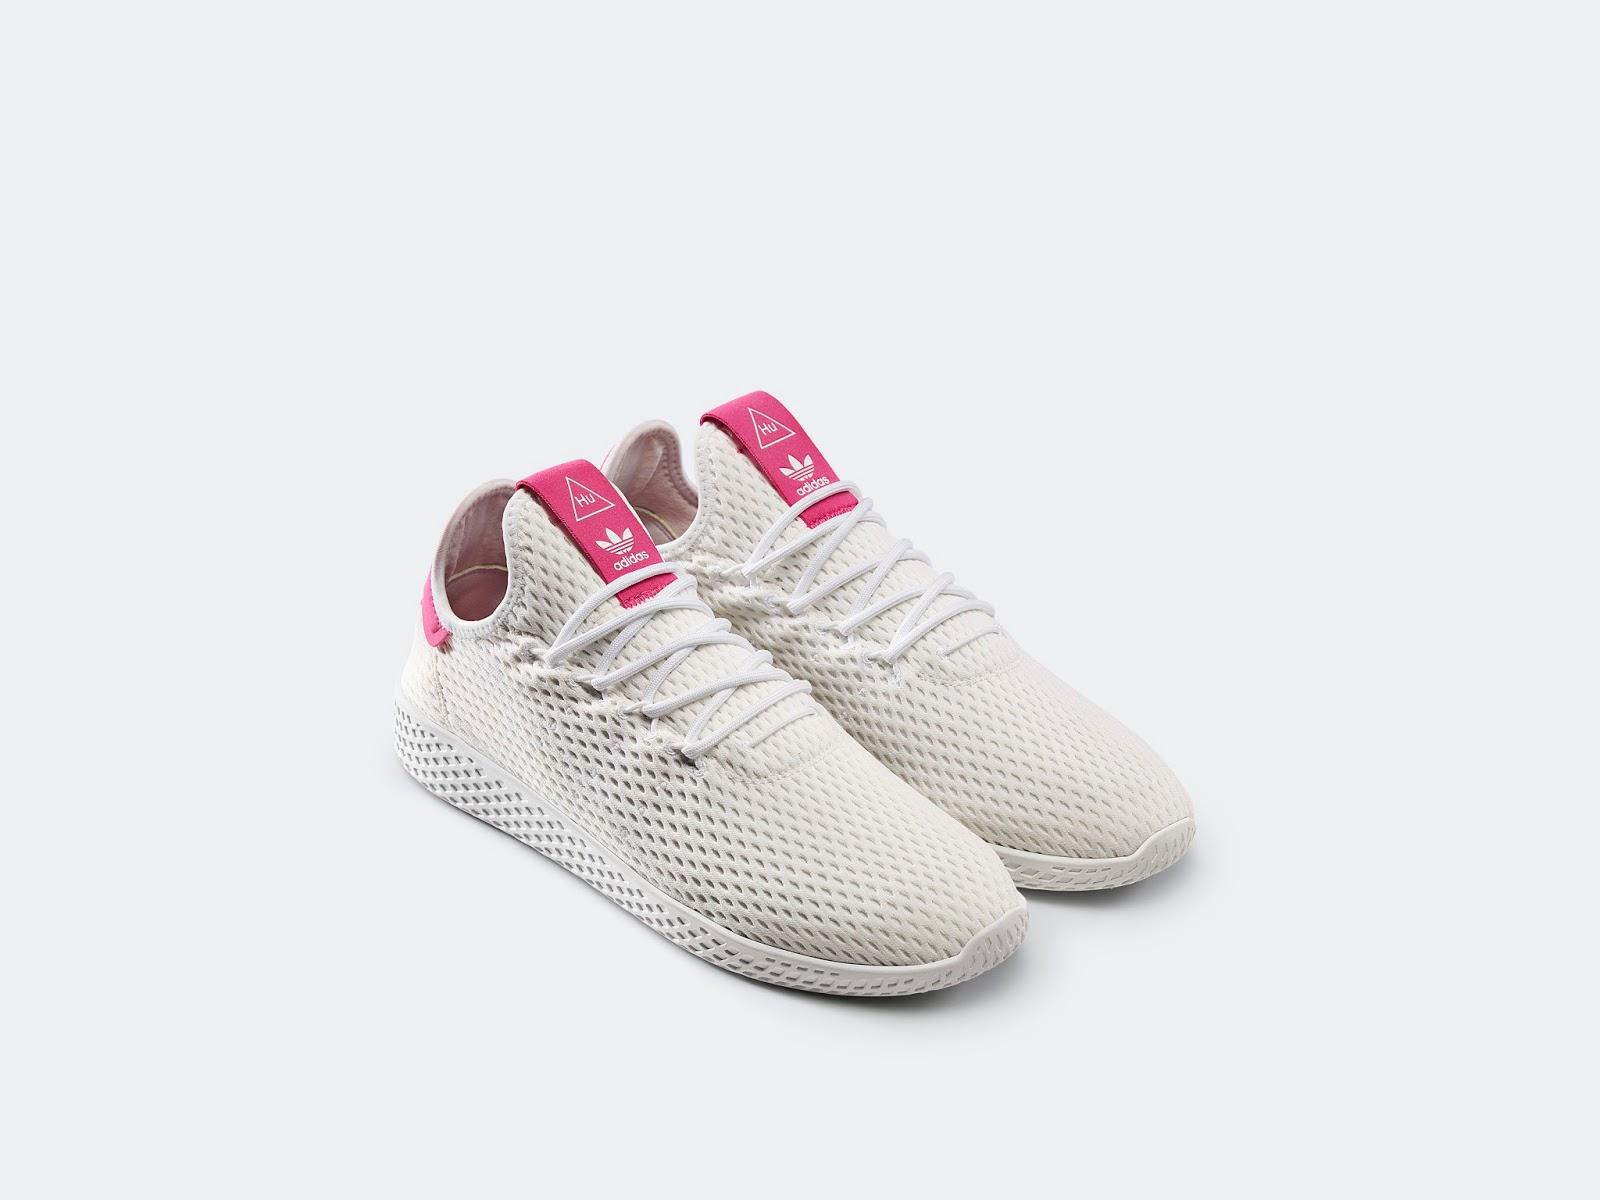 1cdf99241ff4d Swag Craze  First Look  adidas Originals Tennis Hu  Pastel Pack